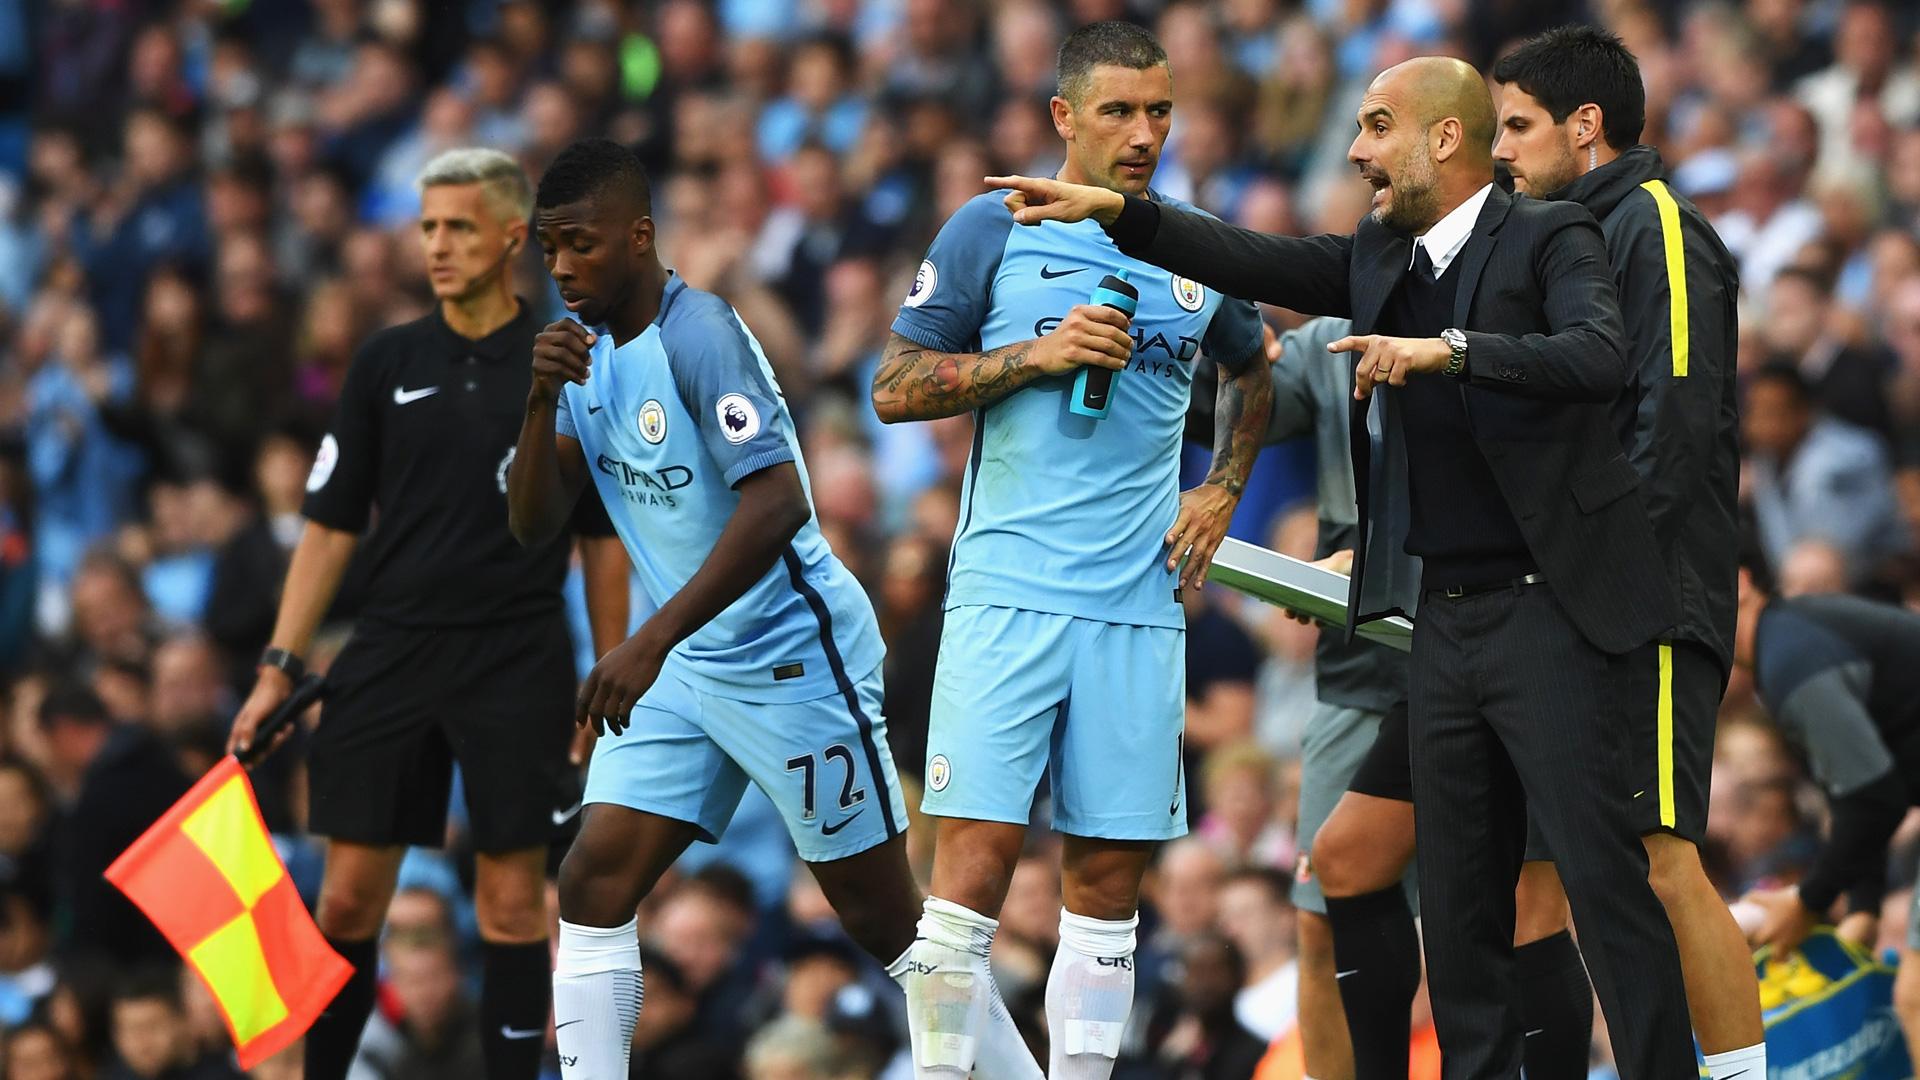 Pep Guardiola Alexandar Kolarov Manchester City